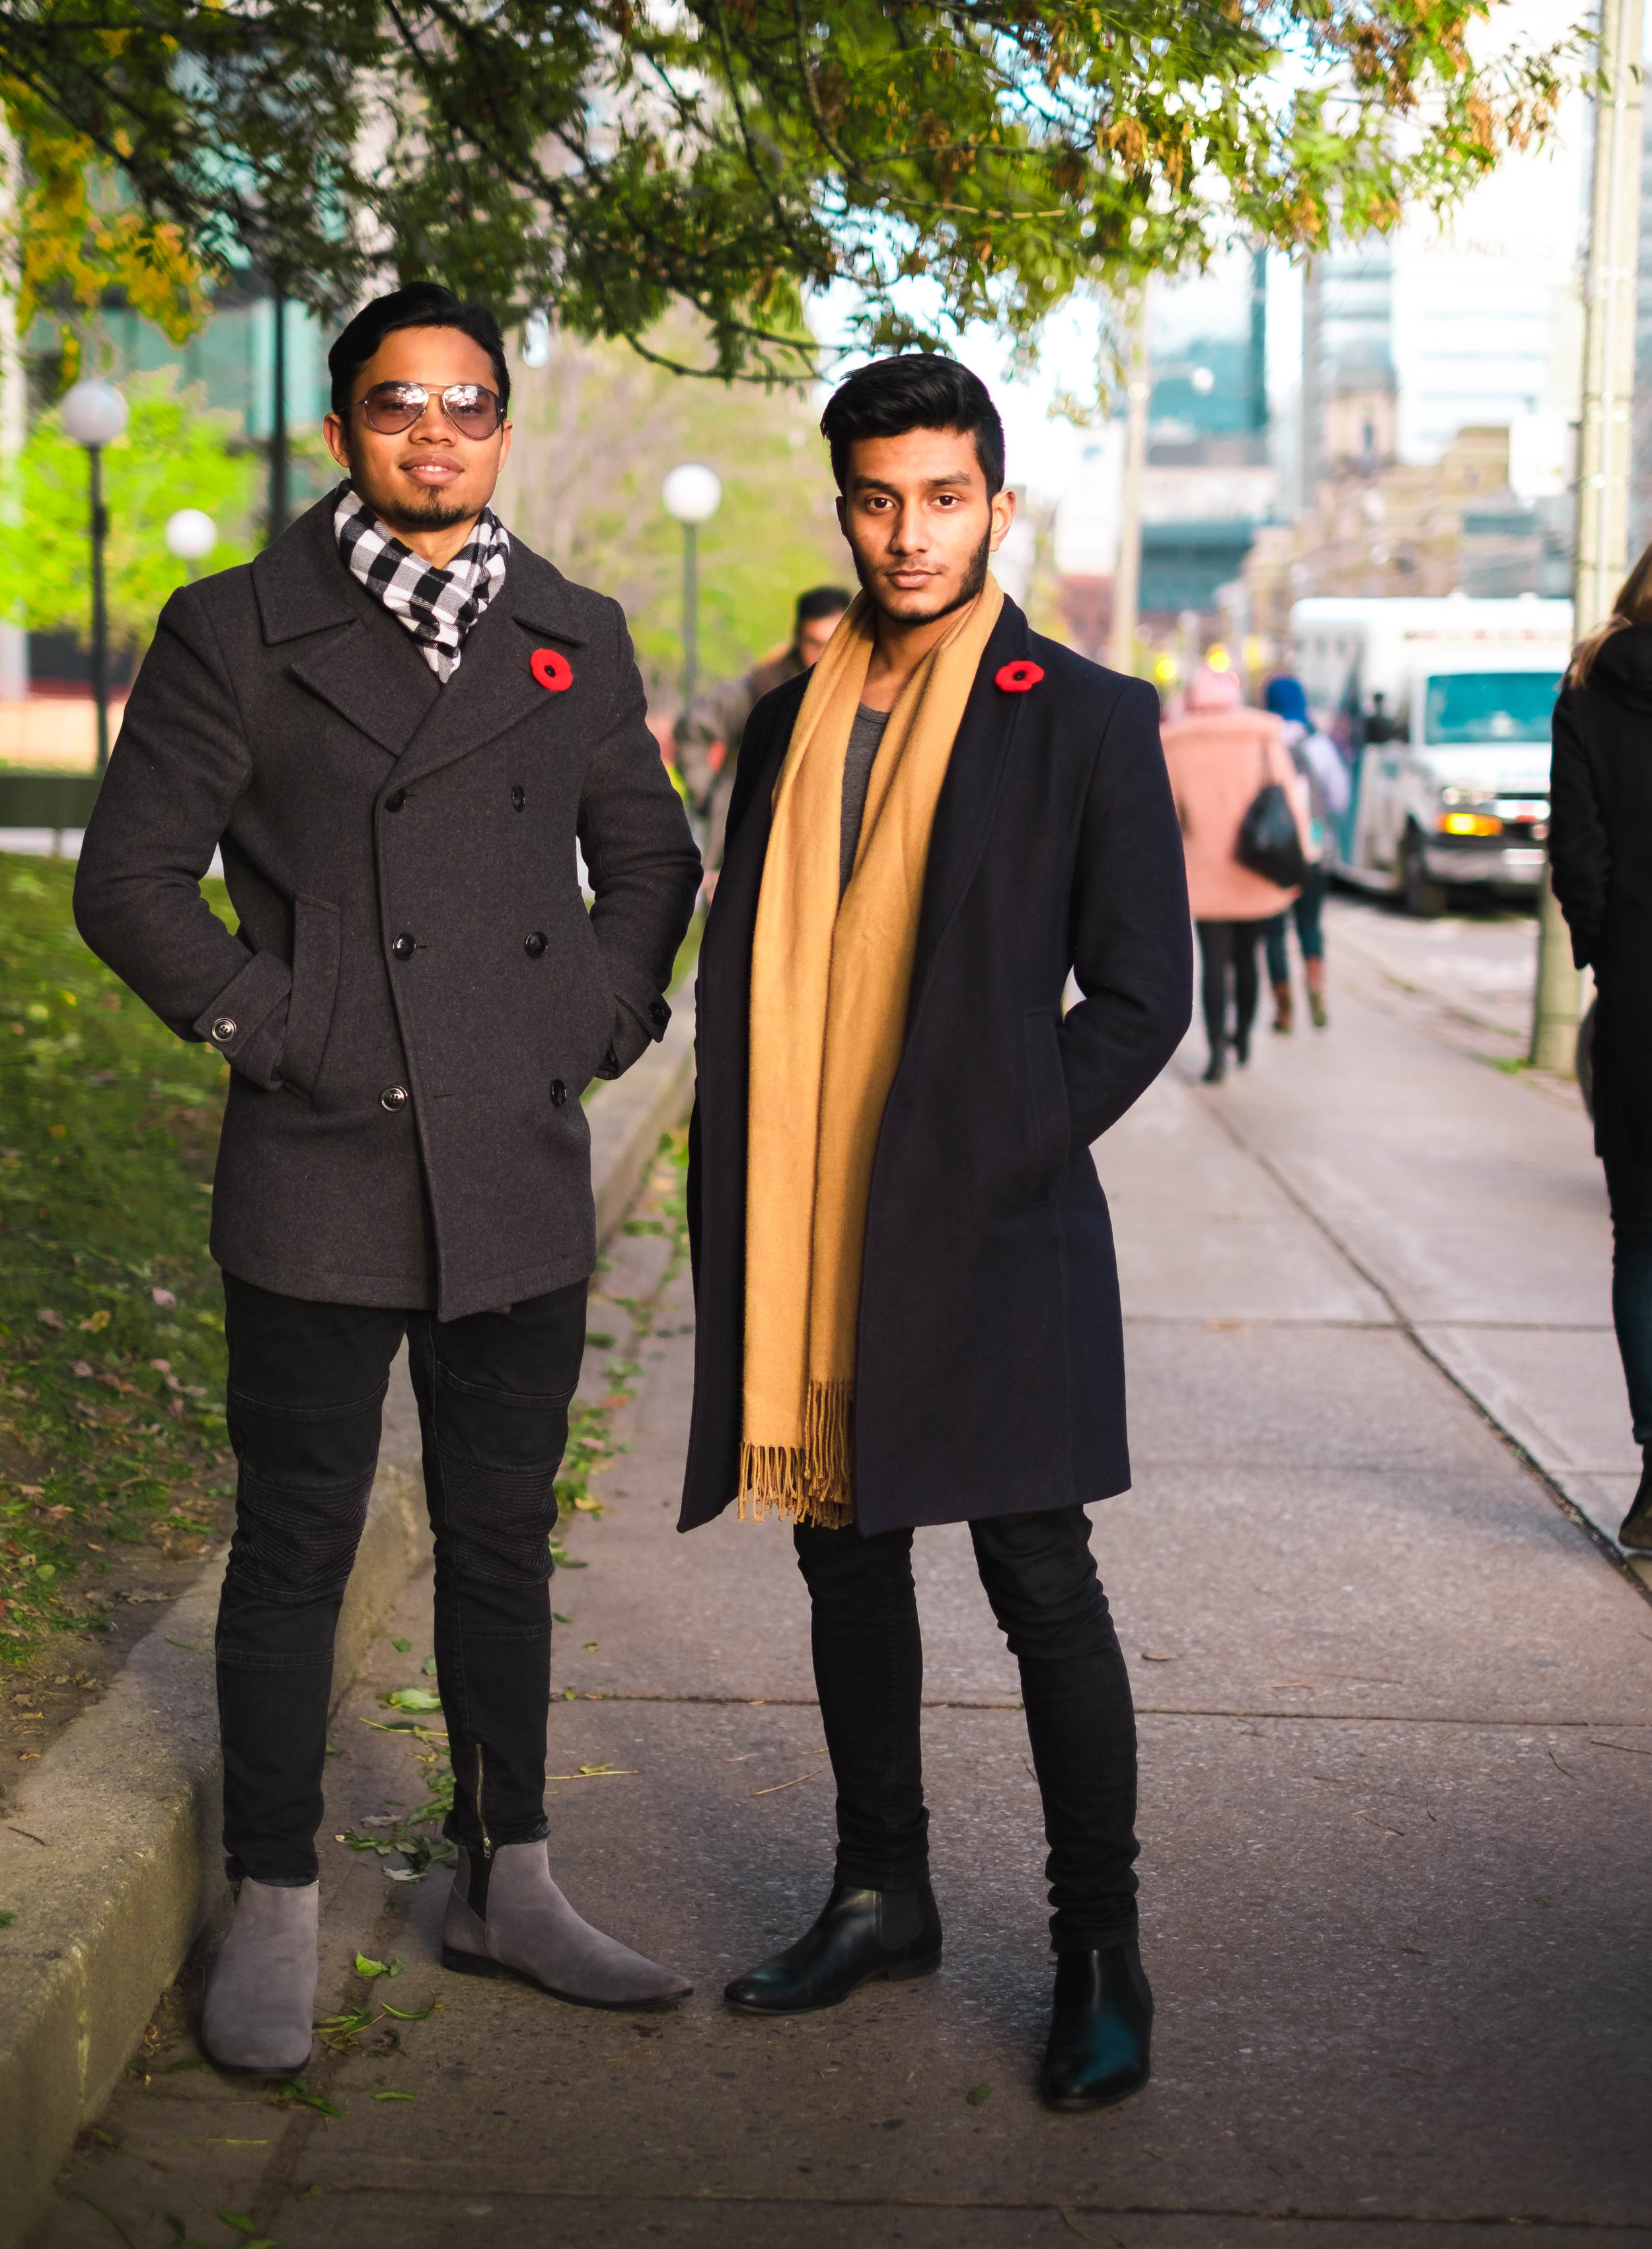 Humans of USMC: Omar Quazi and Shadman Aziz